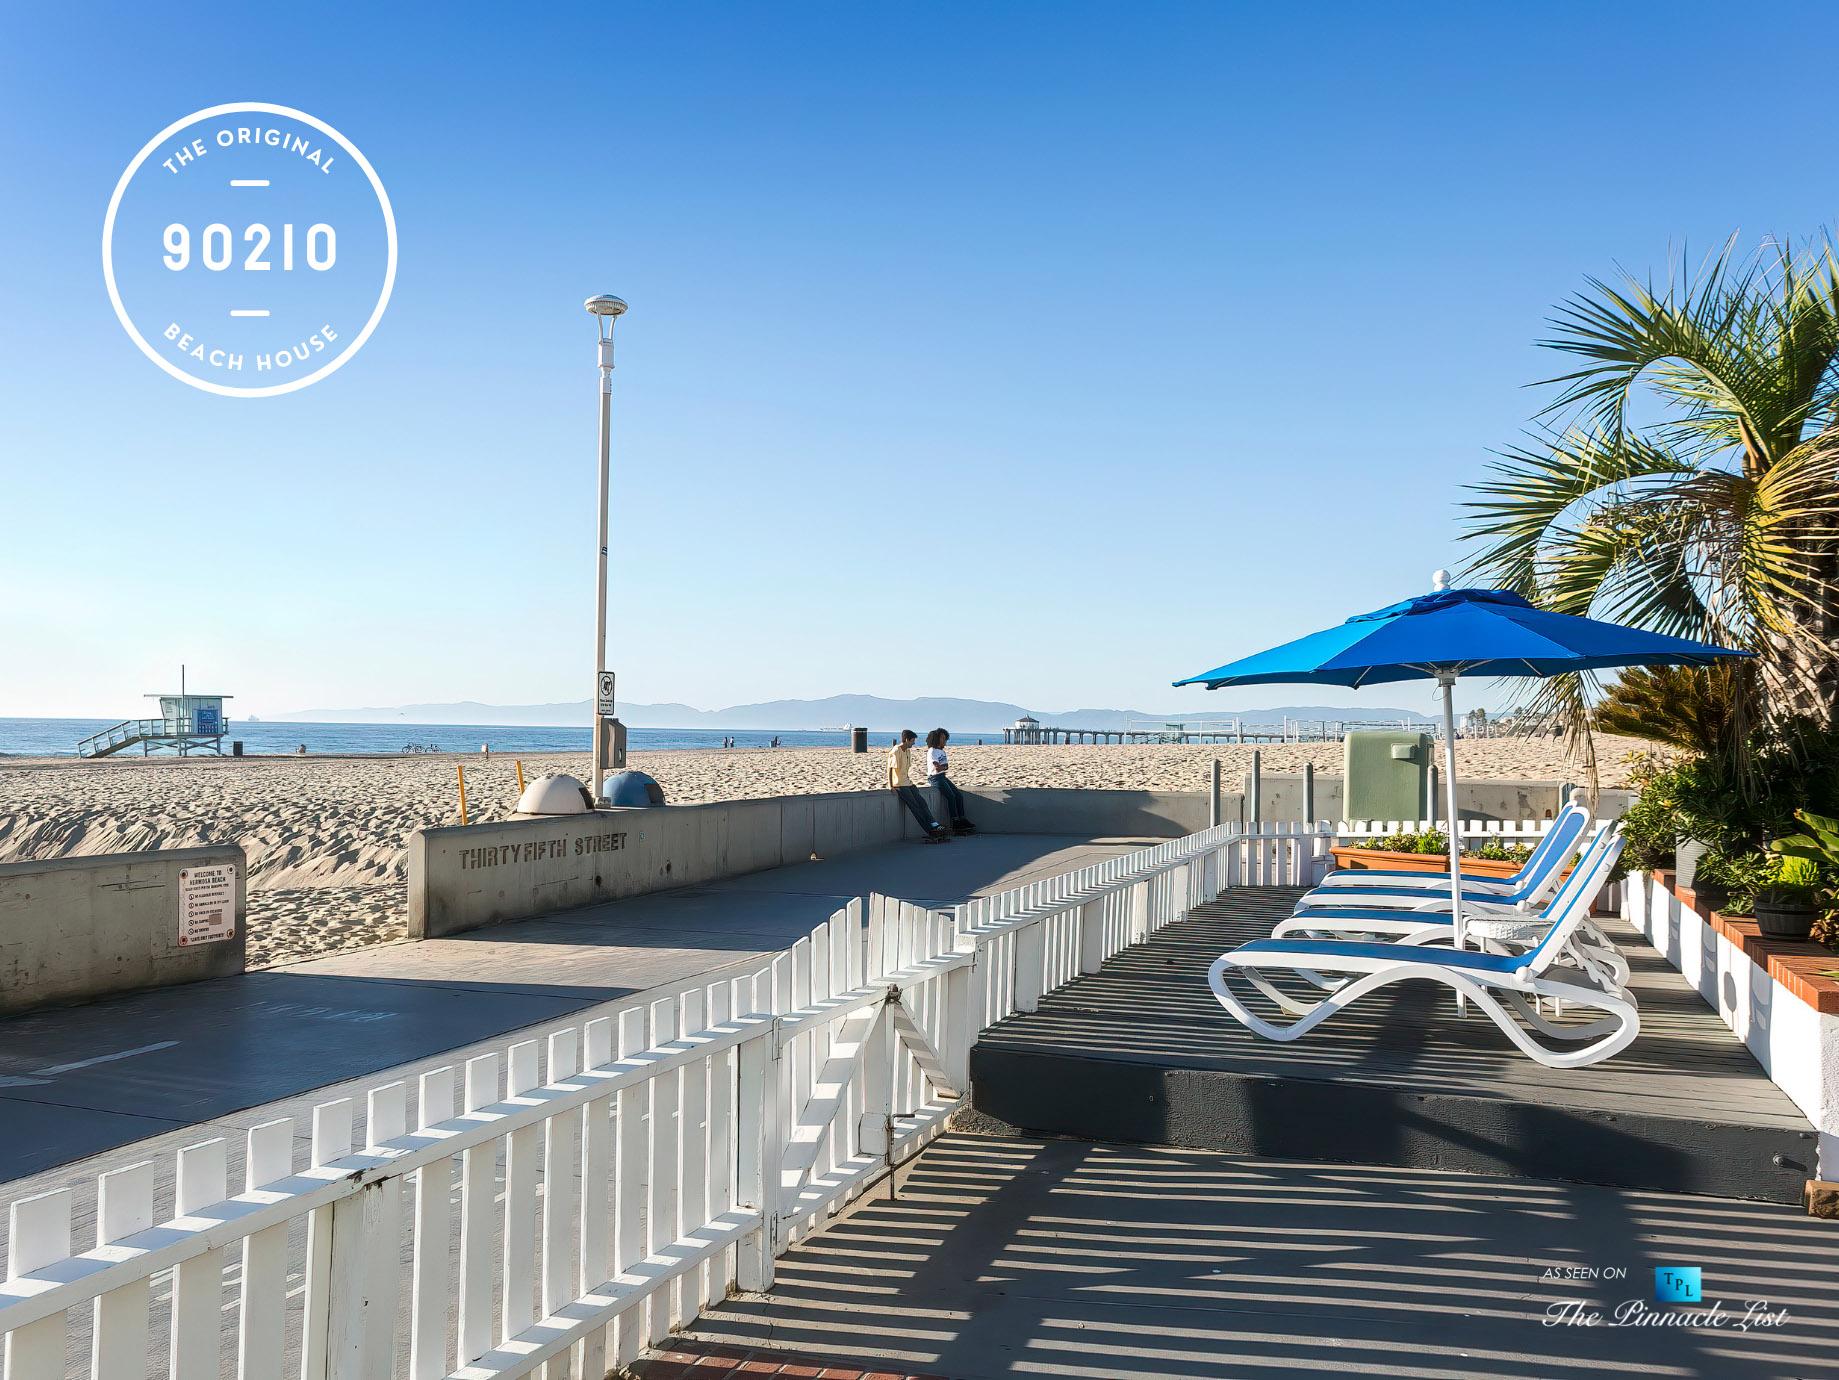 The Original 90210 Beach House - 3500 The Strand, Hermosa Beach, CA, USA - Beachfront Patio